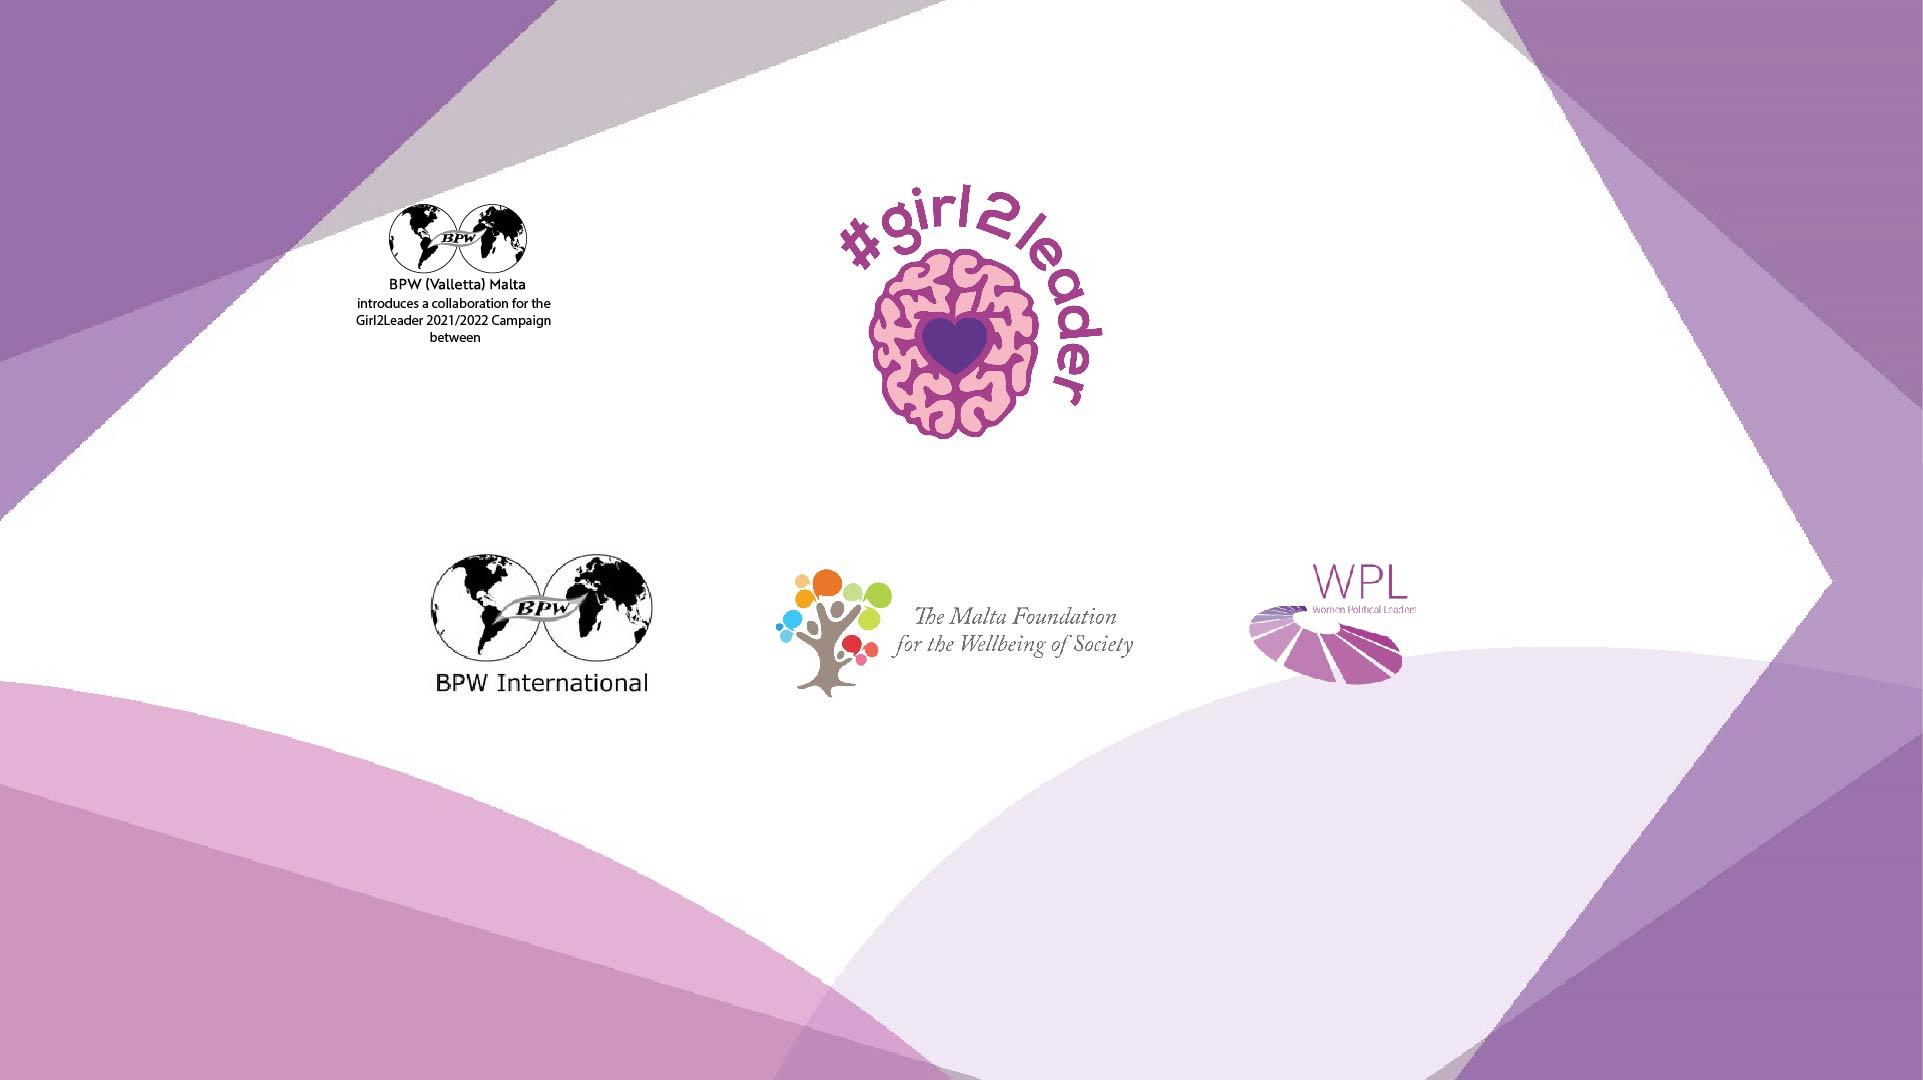 BPW Valletta Malta - Girl2Leader Global Campaign